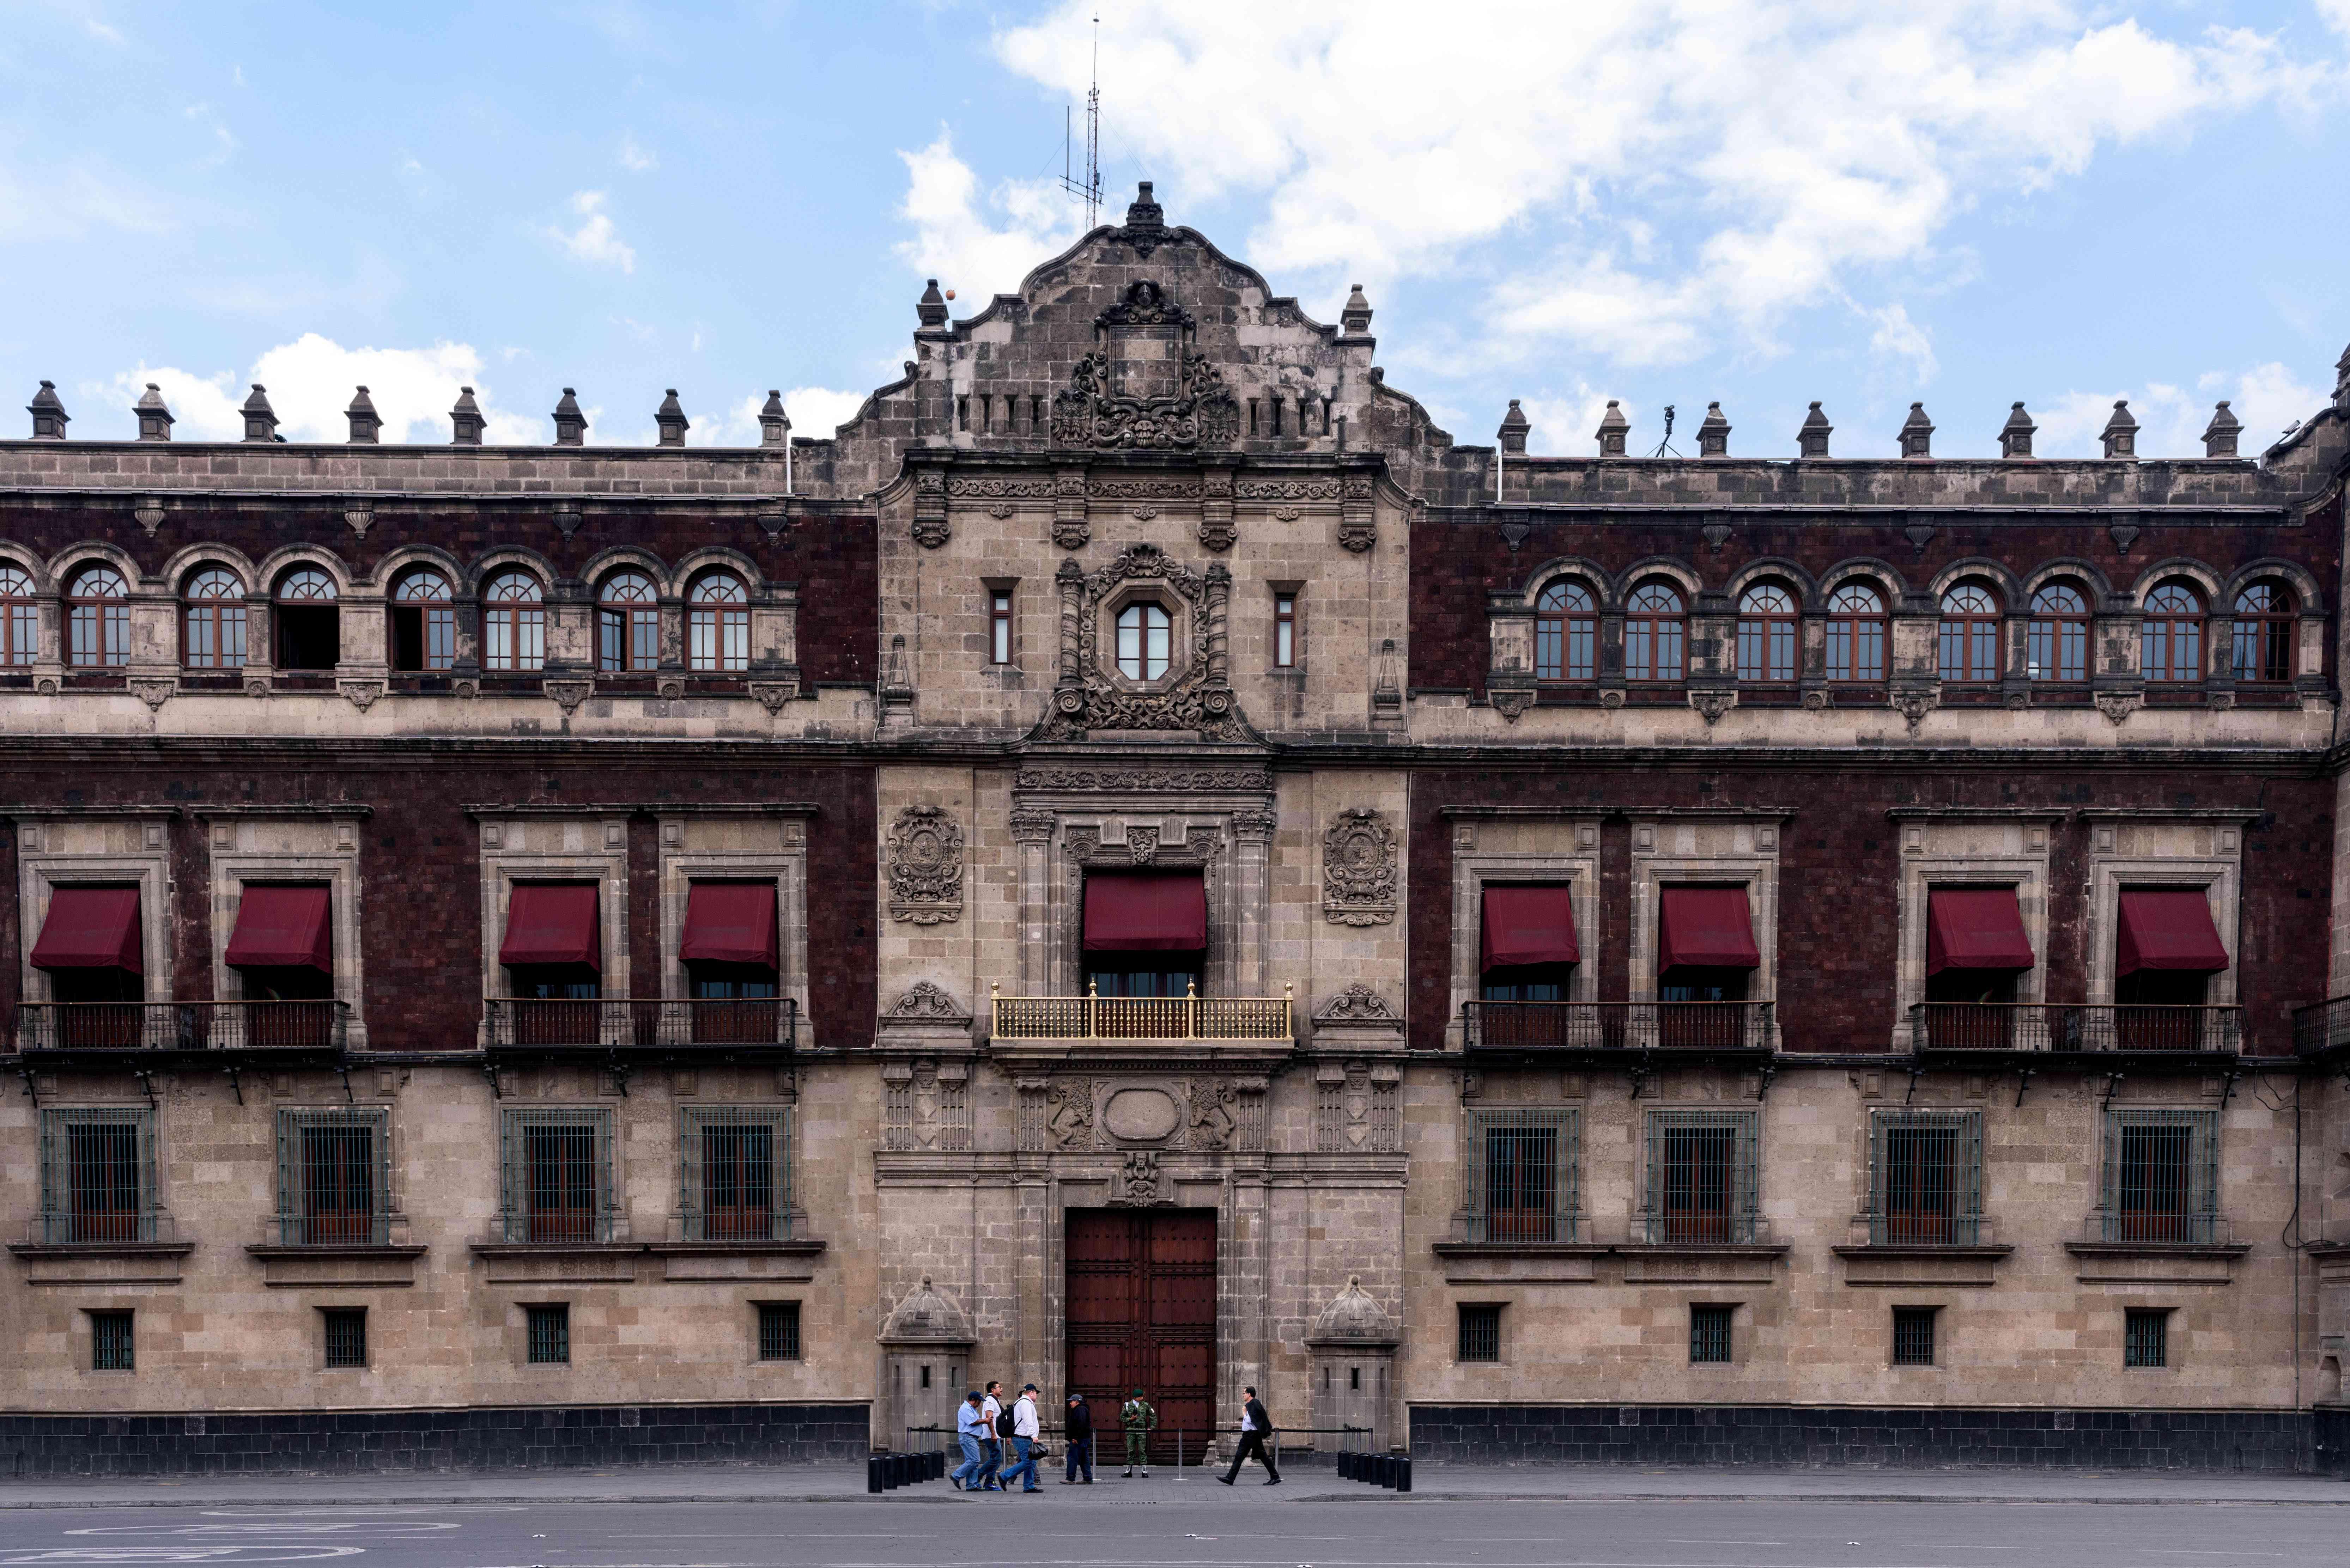 Exterior of the palacio national